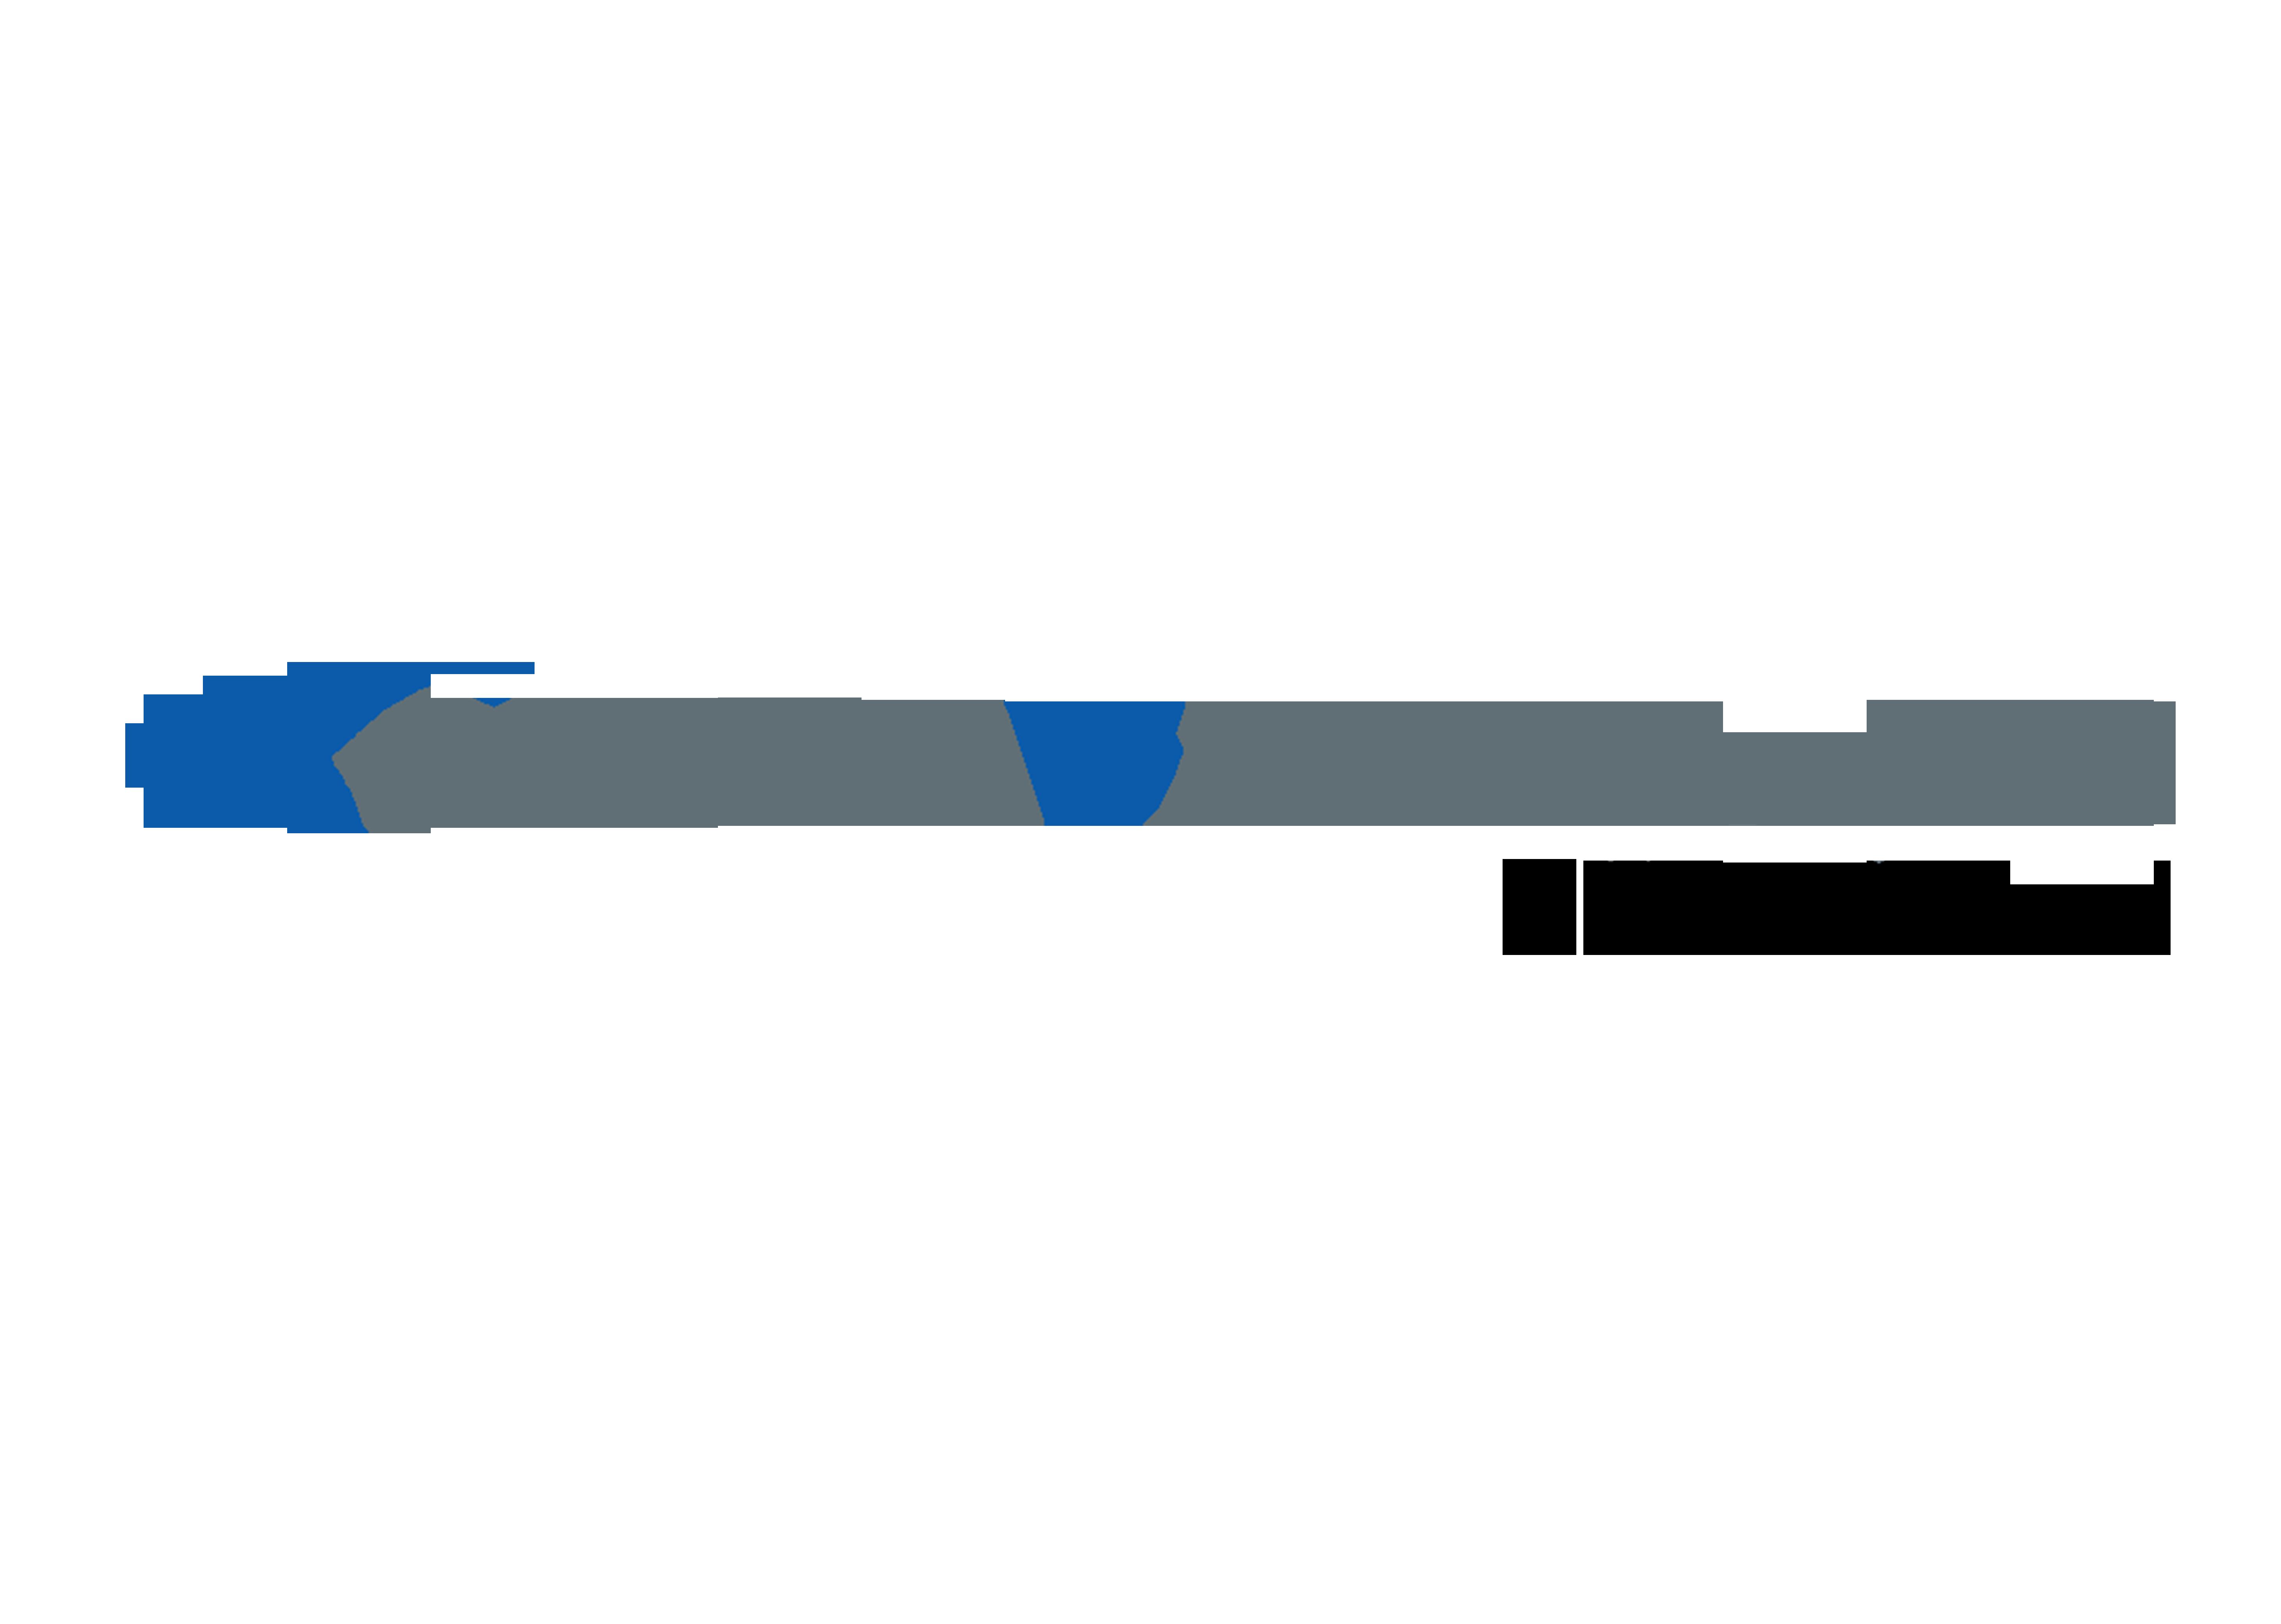 micafluid